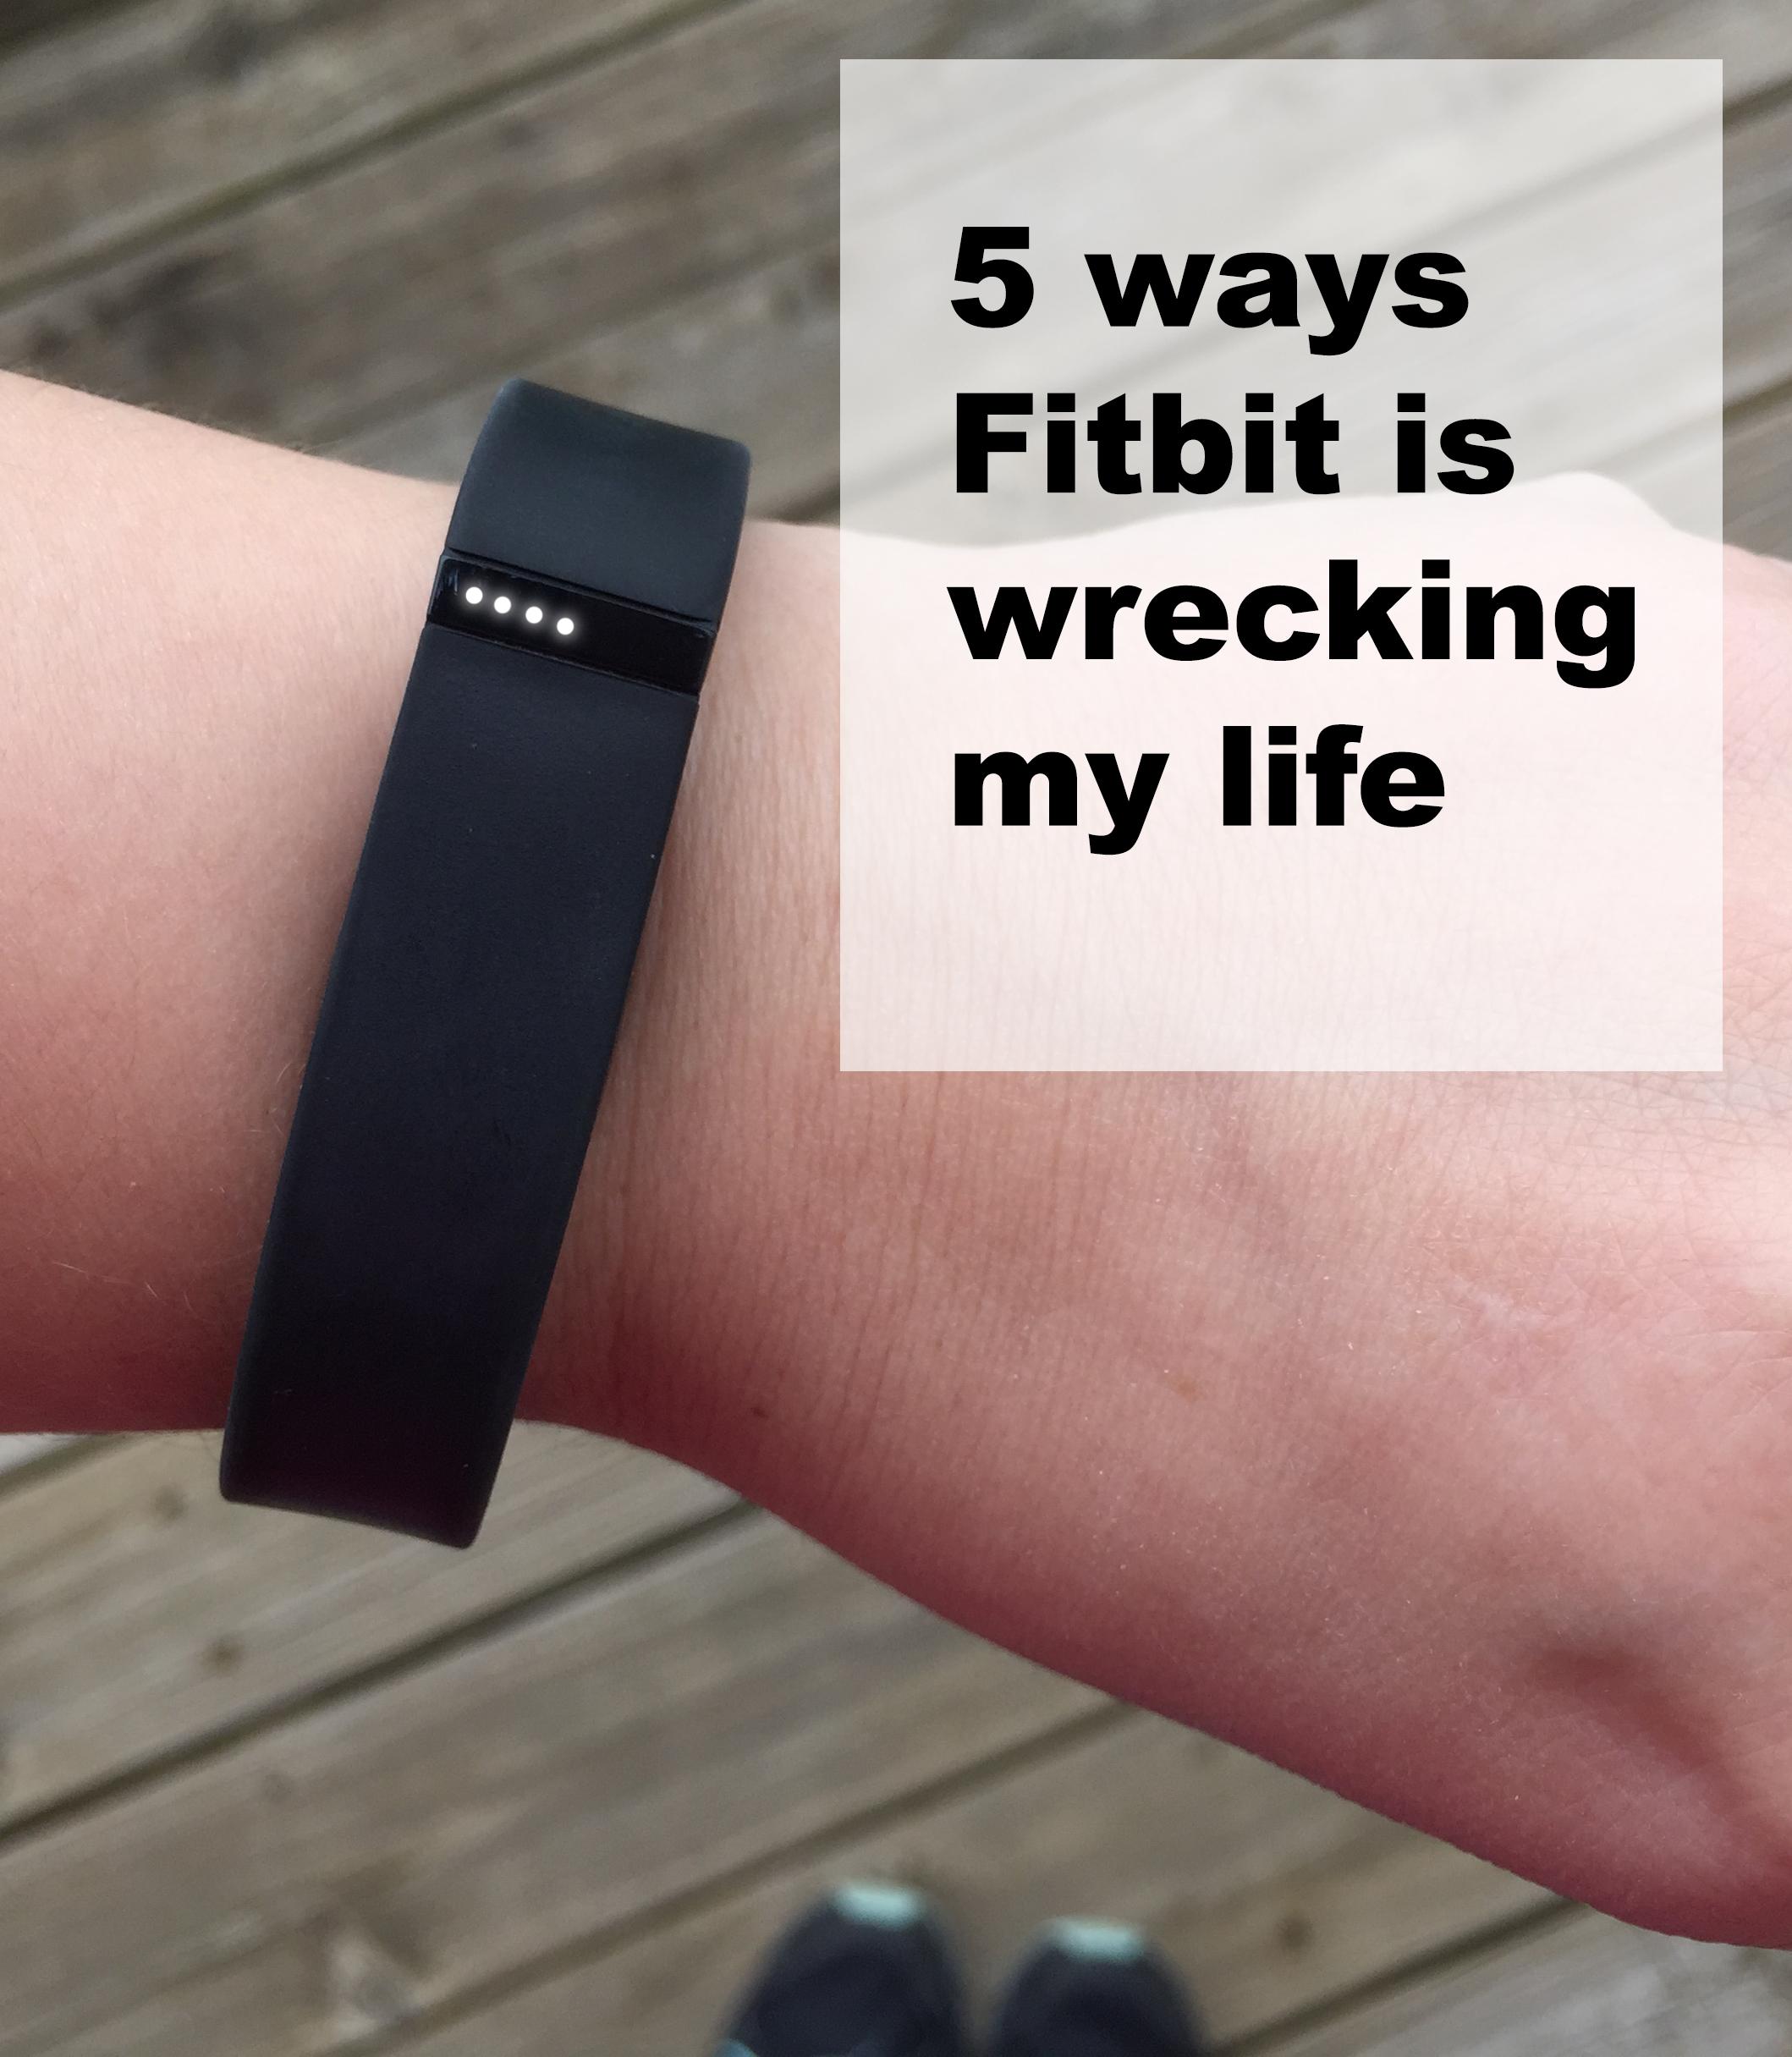 fitbit-is-ruining-my-life.jpg